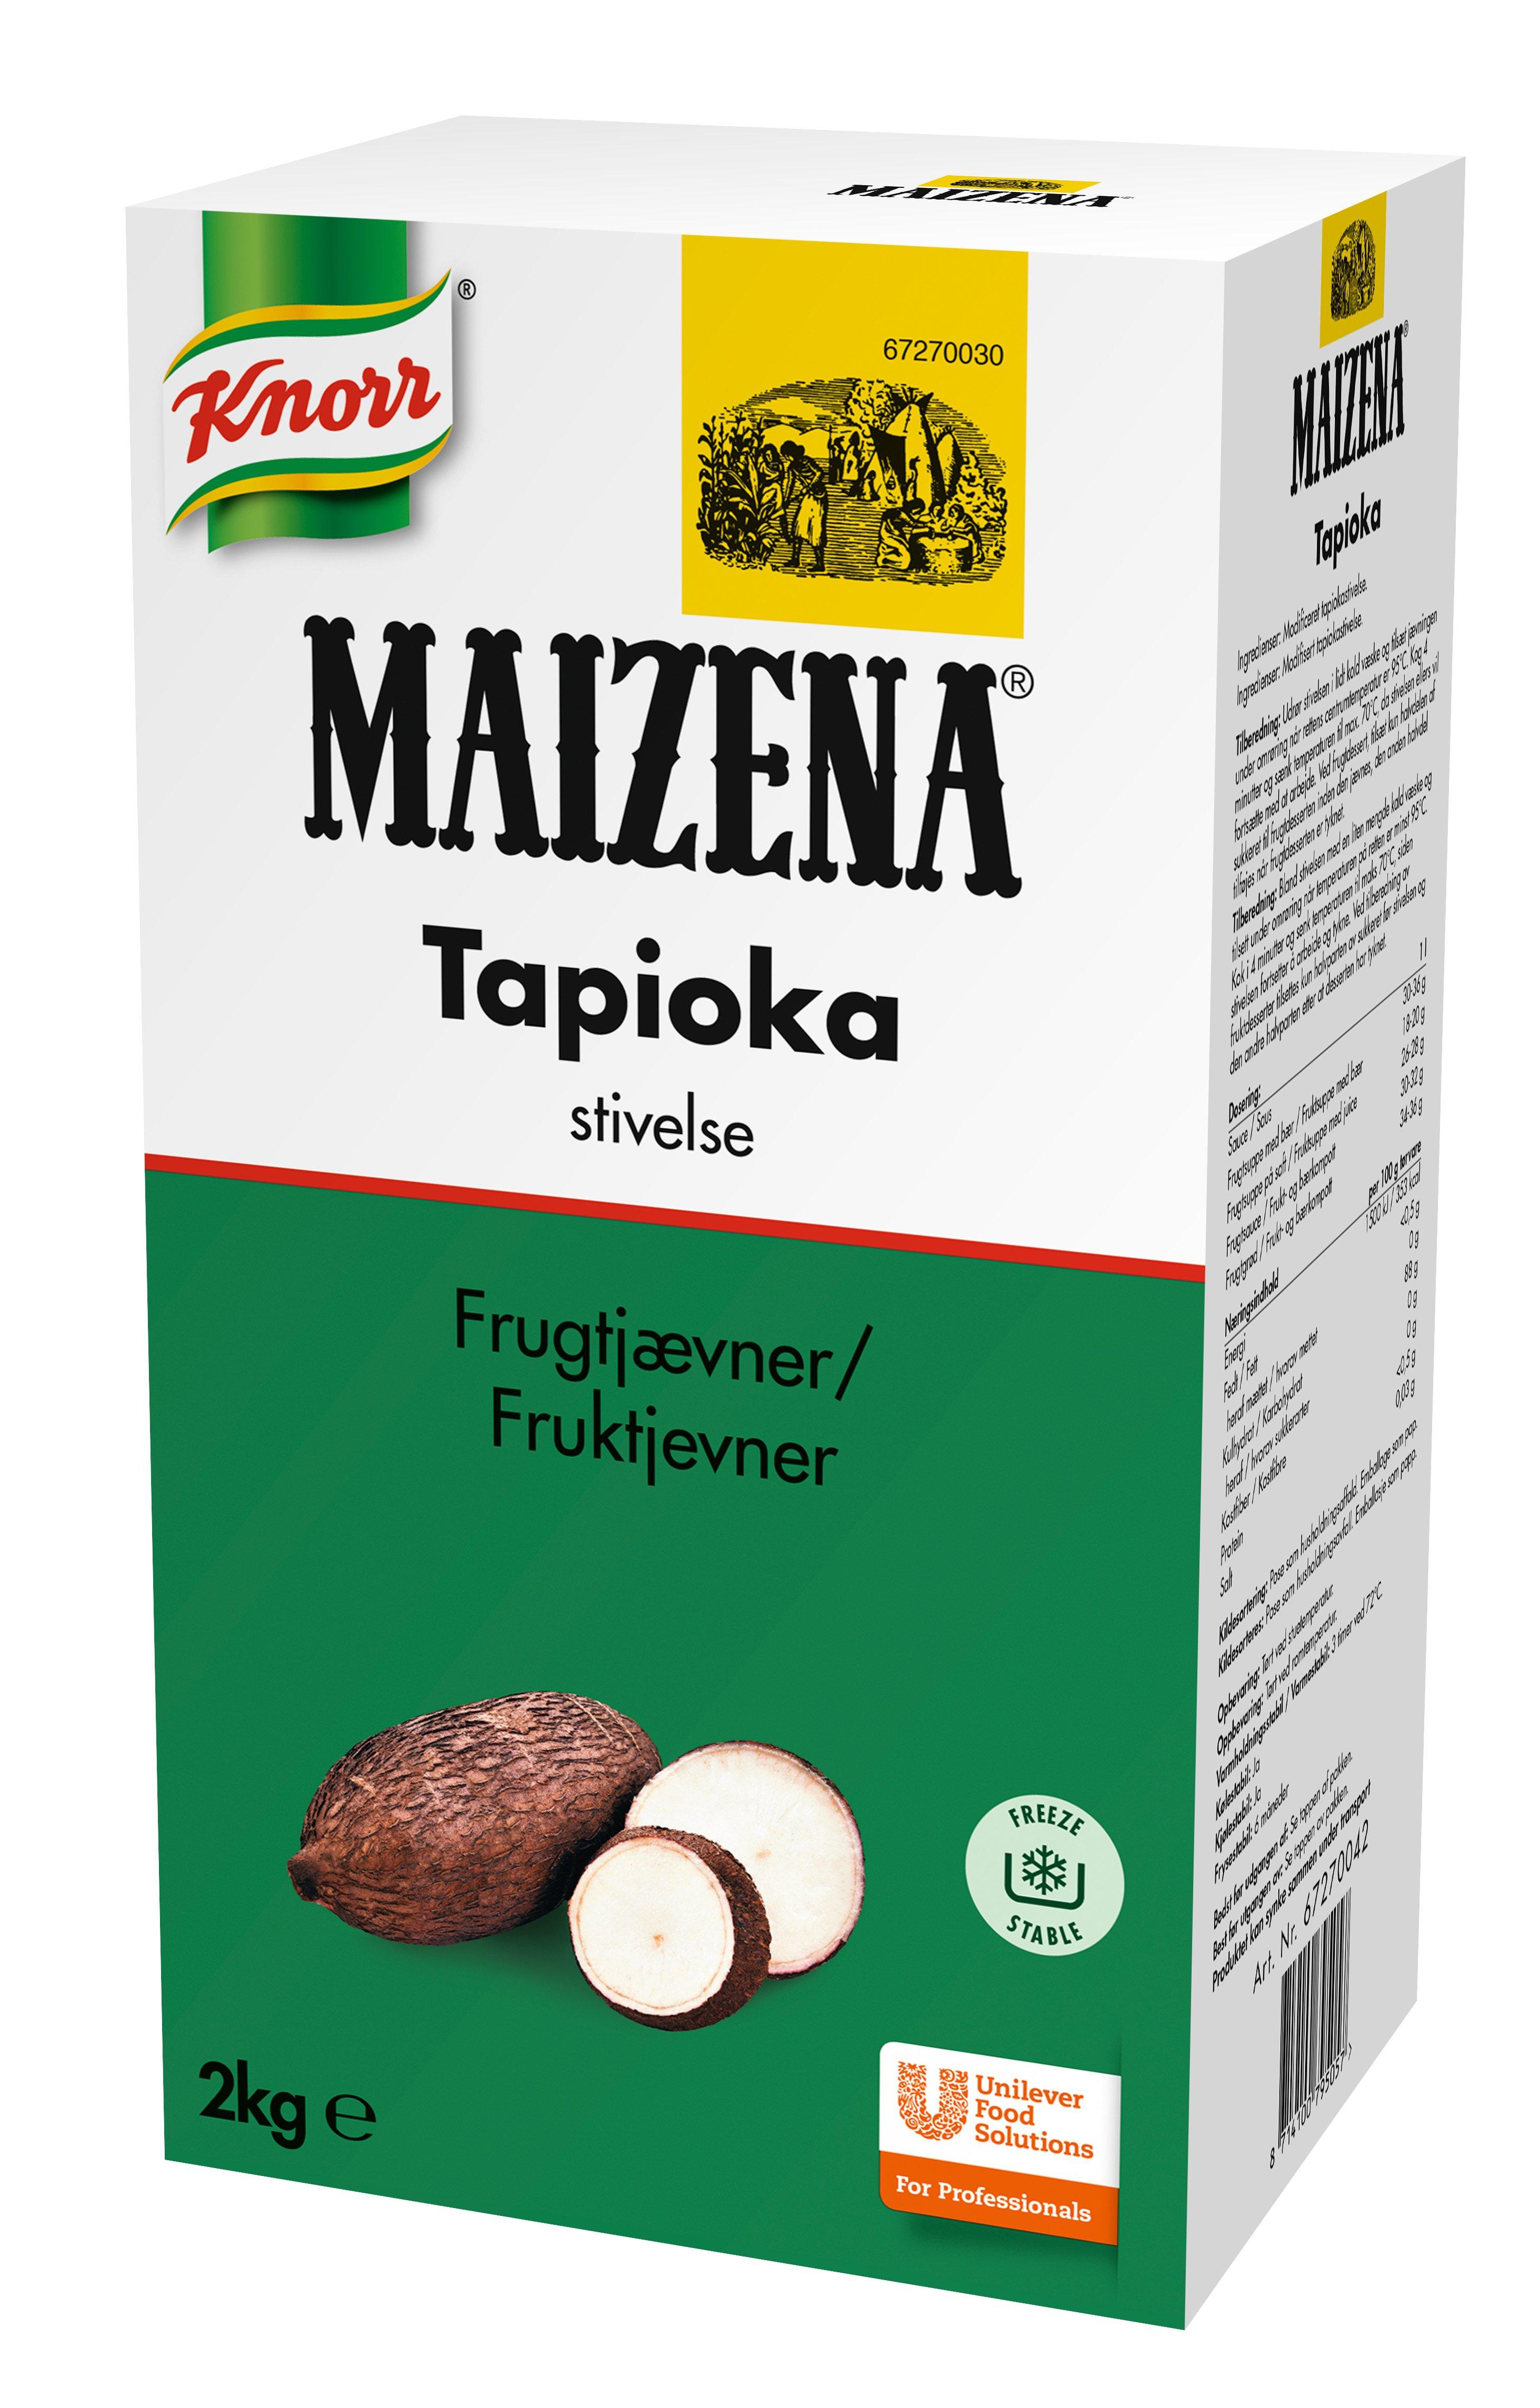 Maizena Tapioka stivelse (Fruktjevner) 2kg